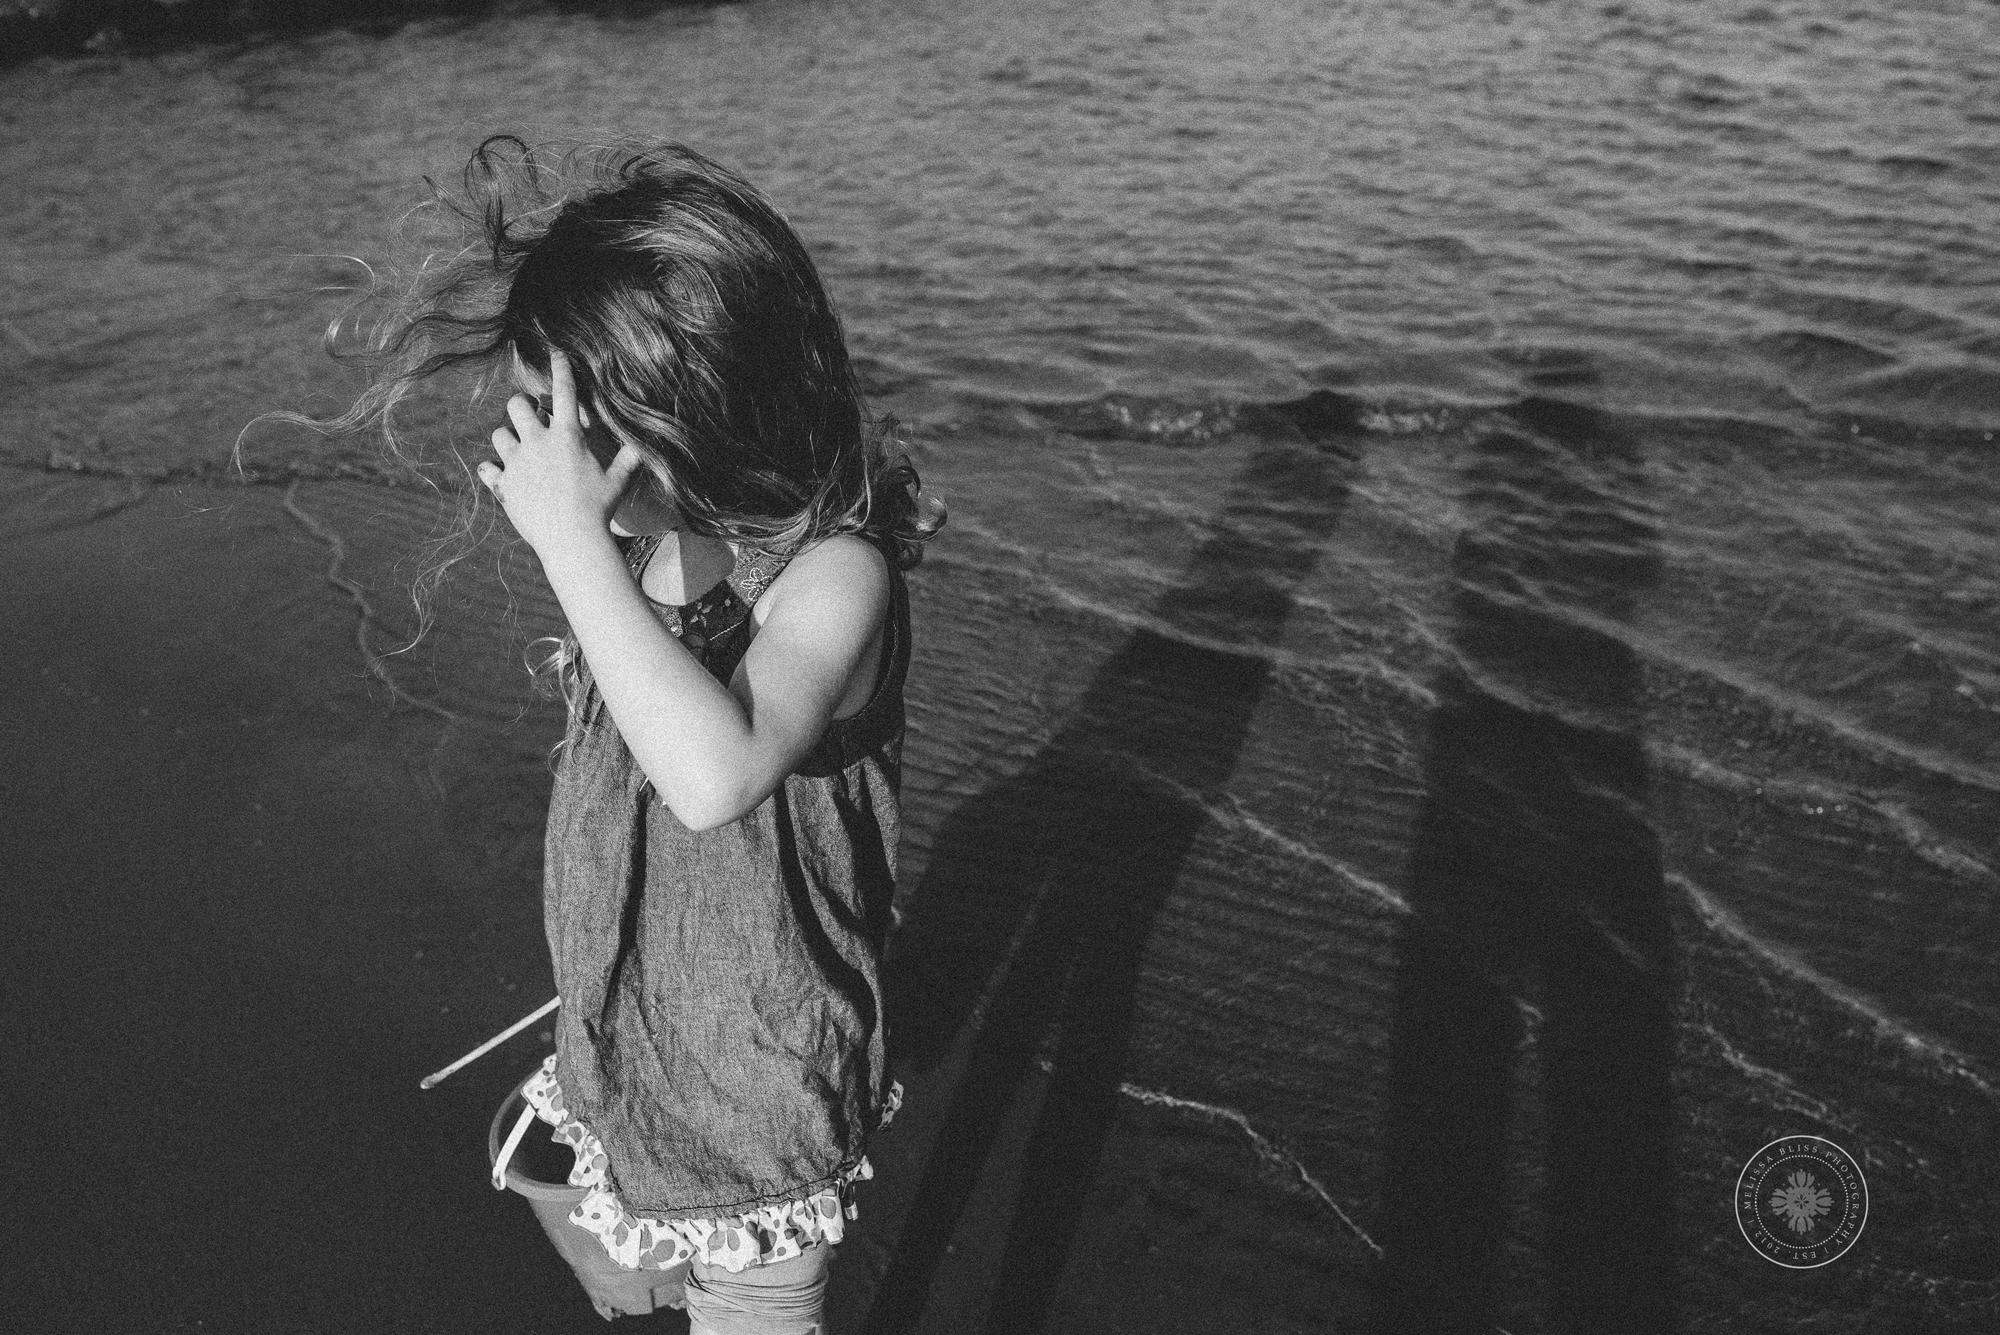 sandbridge-photographers-melissa-bliss-photography-black-and-white-photo-young-girl-on-the-shore